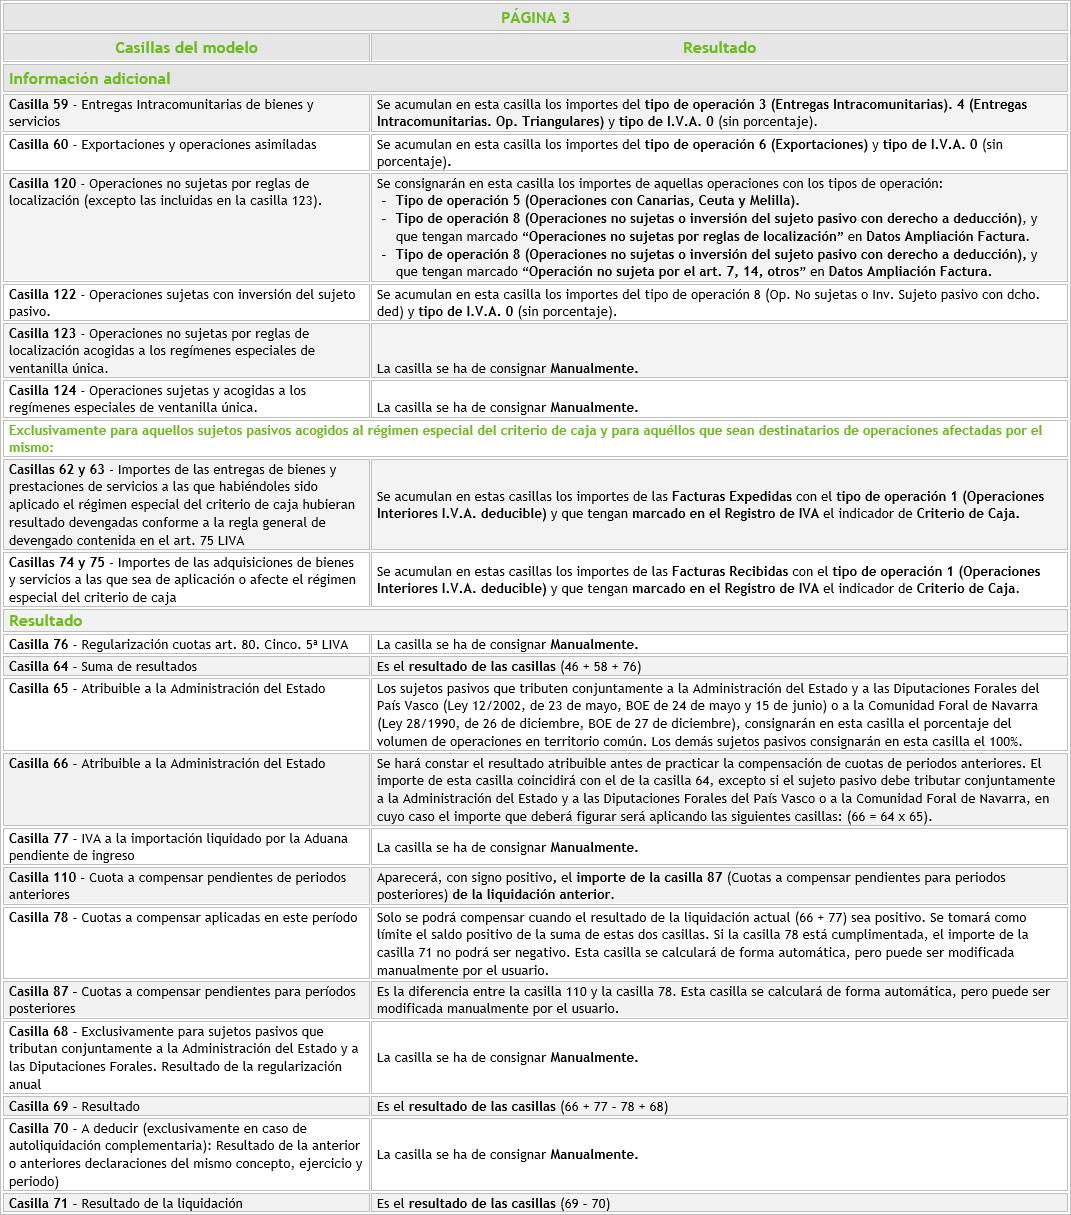 Modelo 303 Pag 3 Casillas 2021